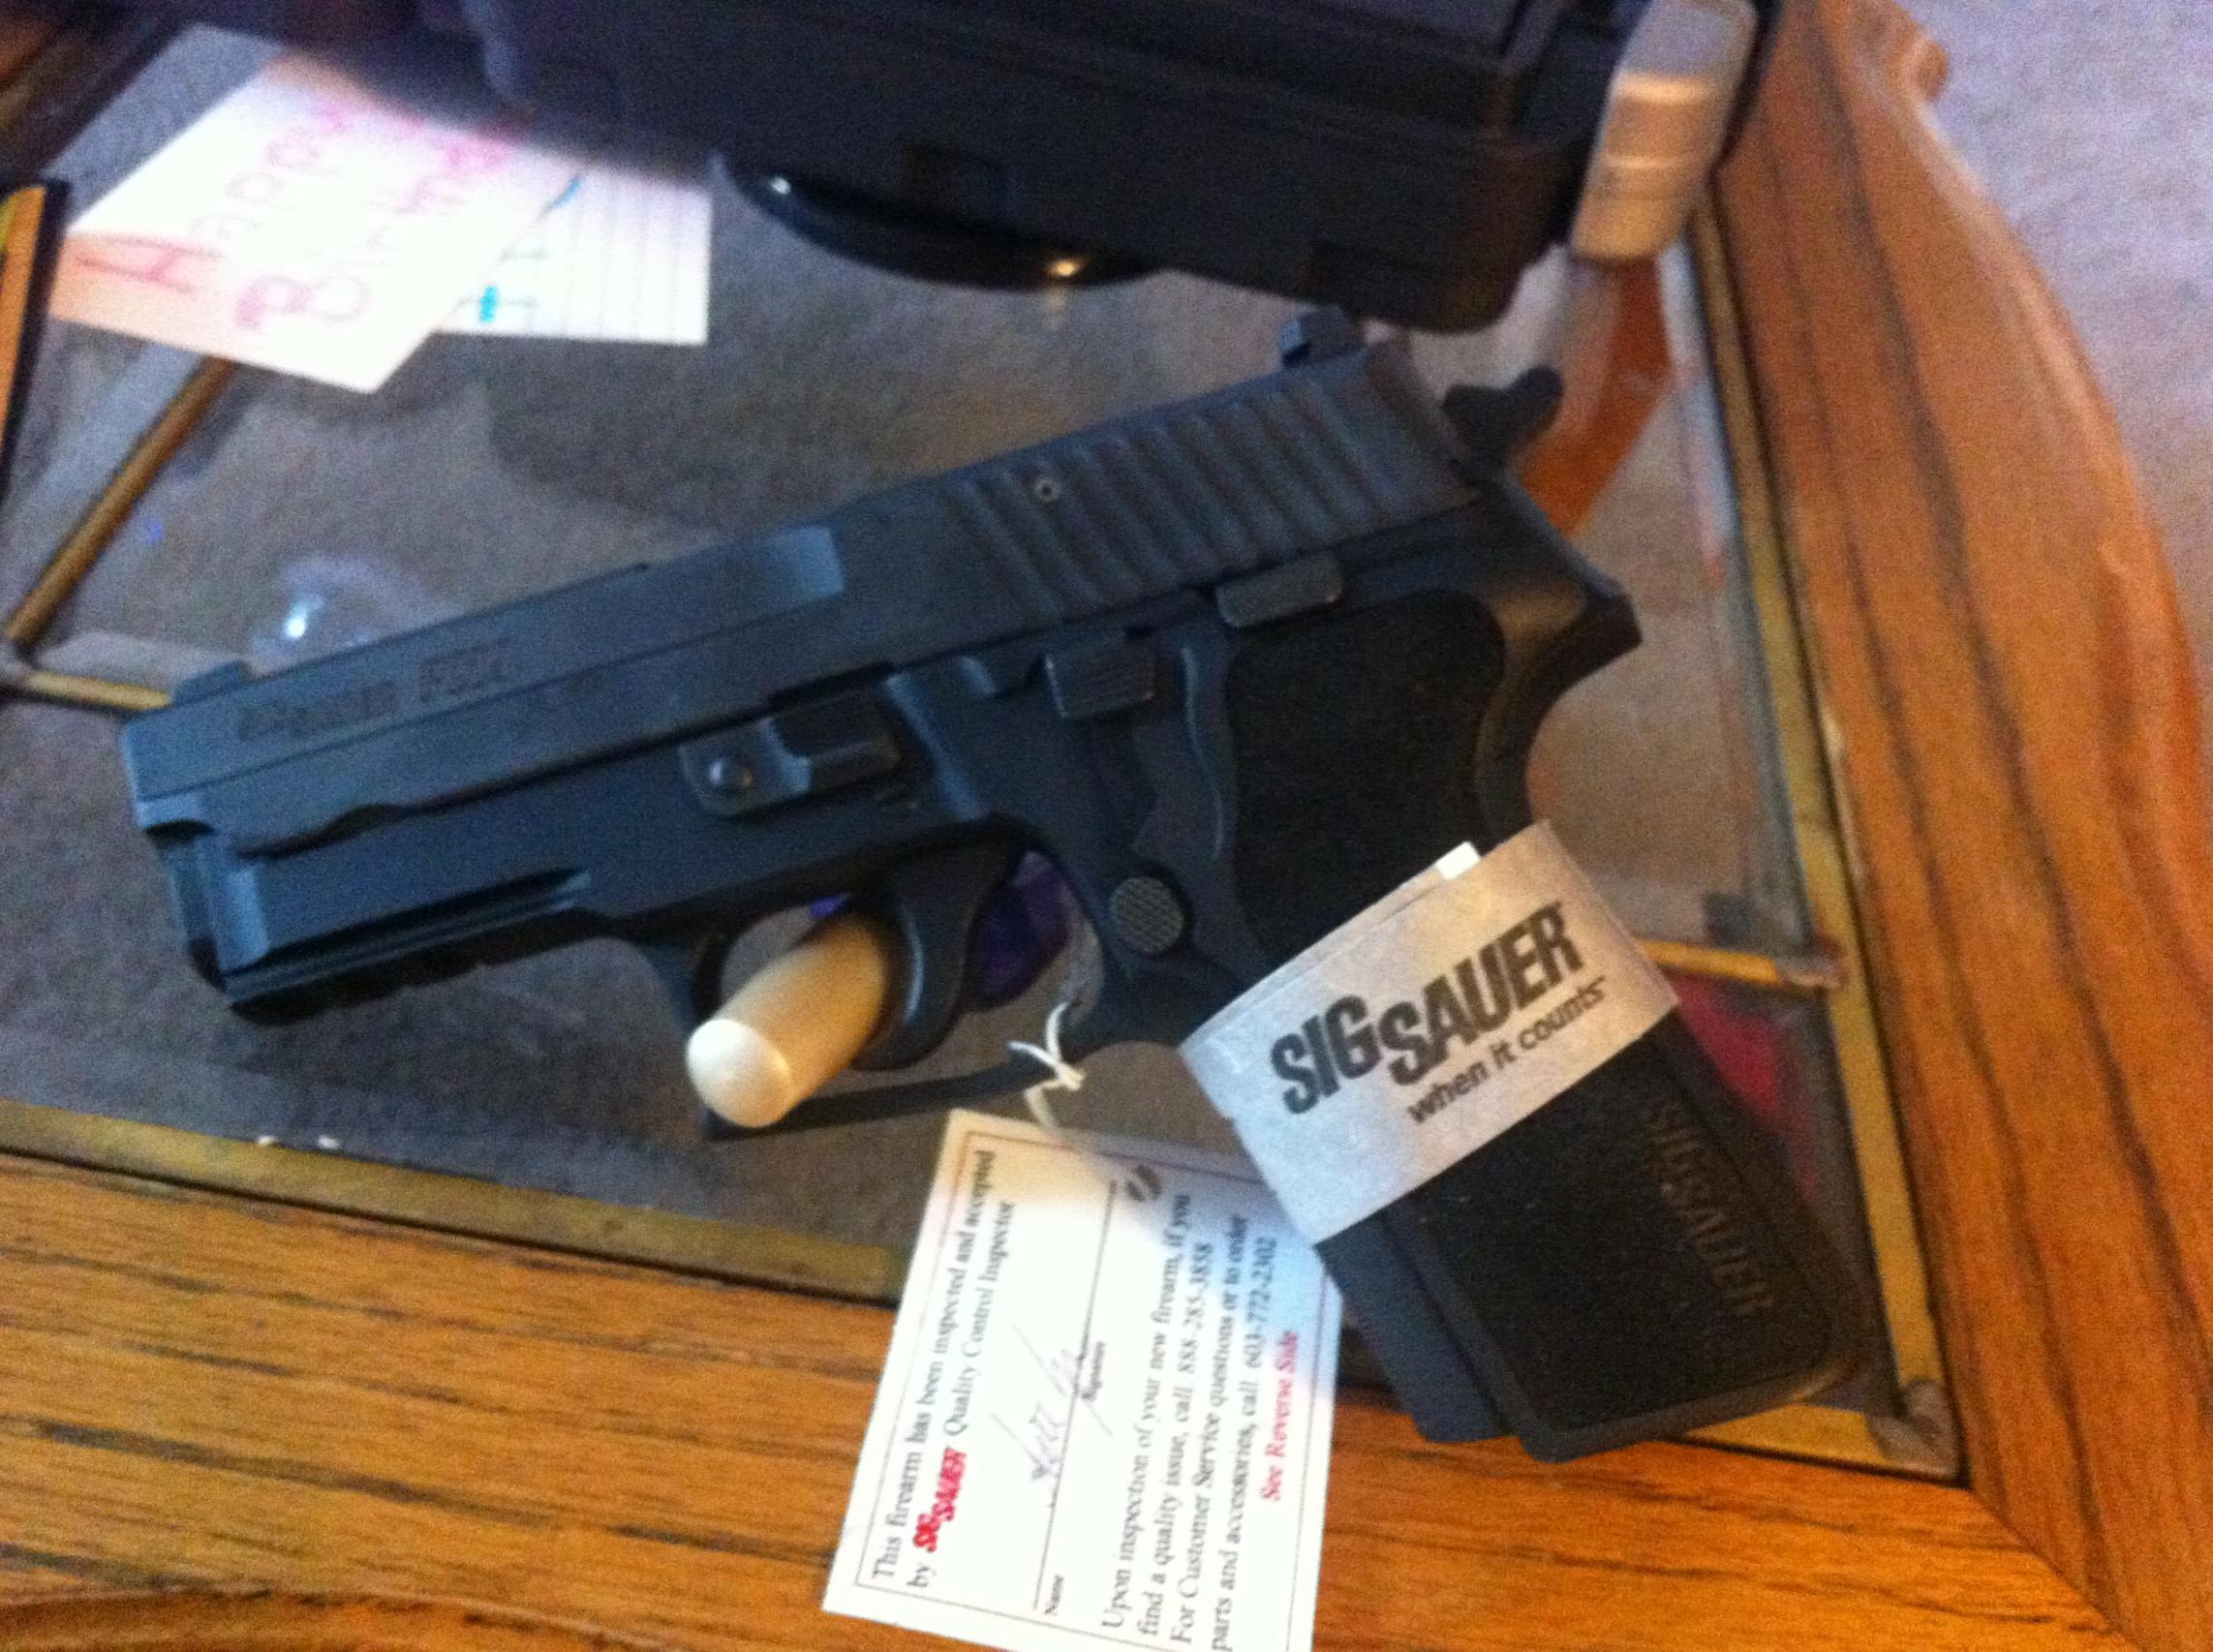 Range Report on my new Sig Sauer P229-img_4535.jpg